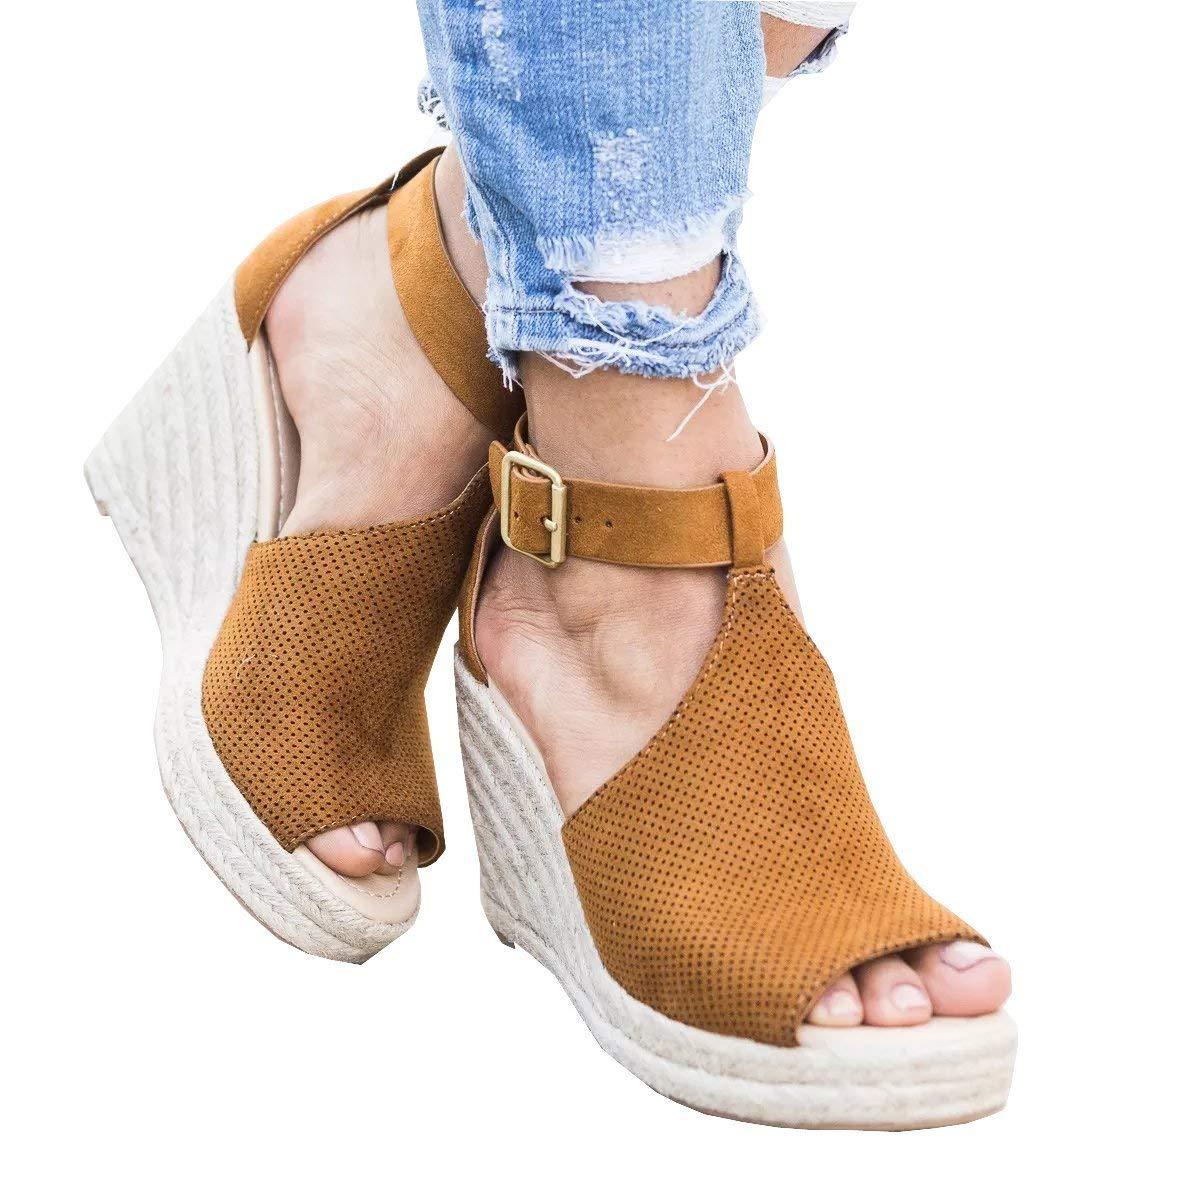 cd53d5209c55 Voguegirl Womens Platform Wedge Heel Peep Toe Ankle Strap Slingback Suede  Sandals Brown 5 US